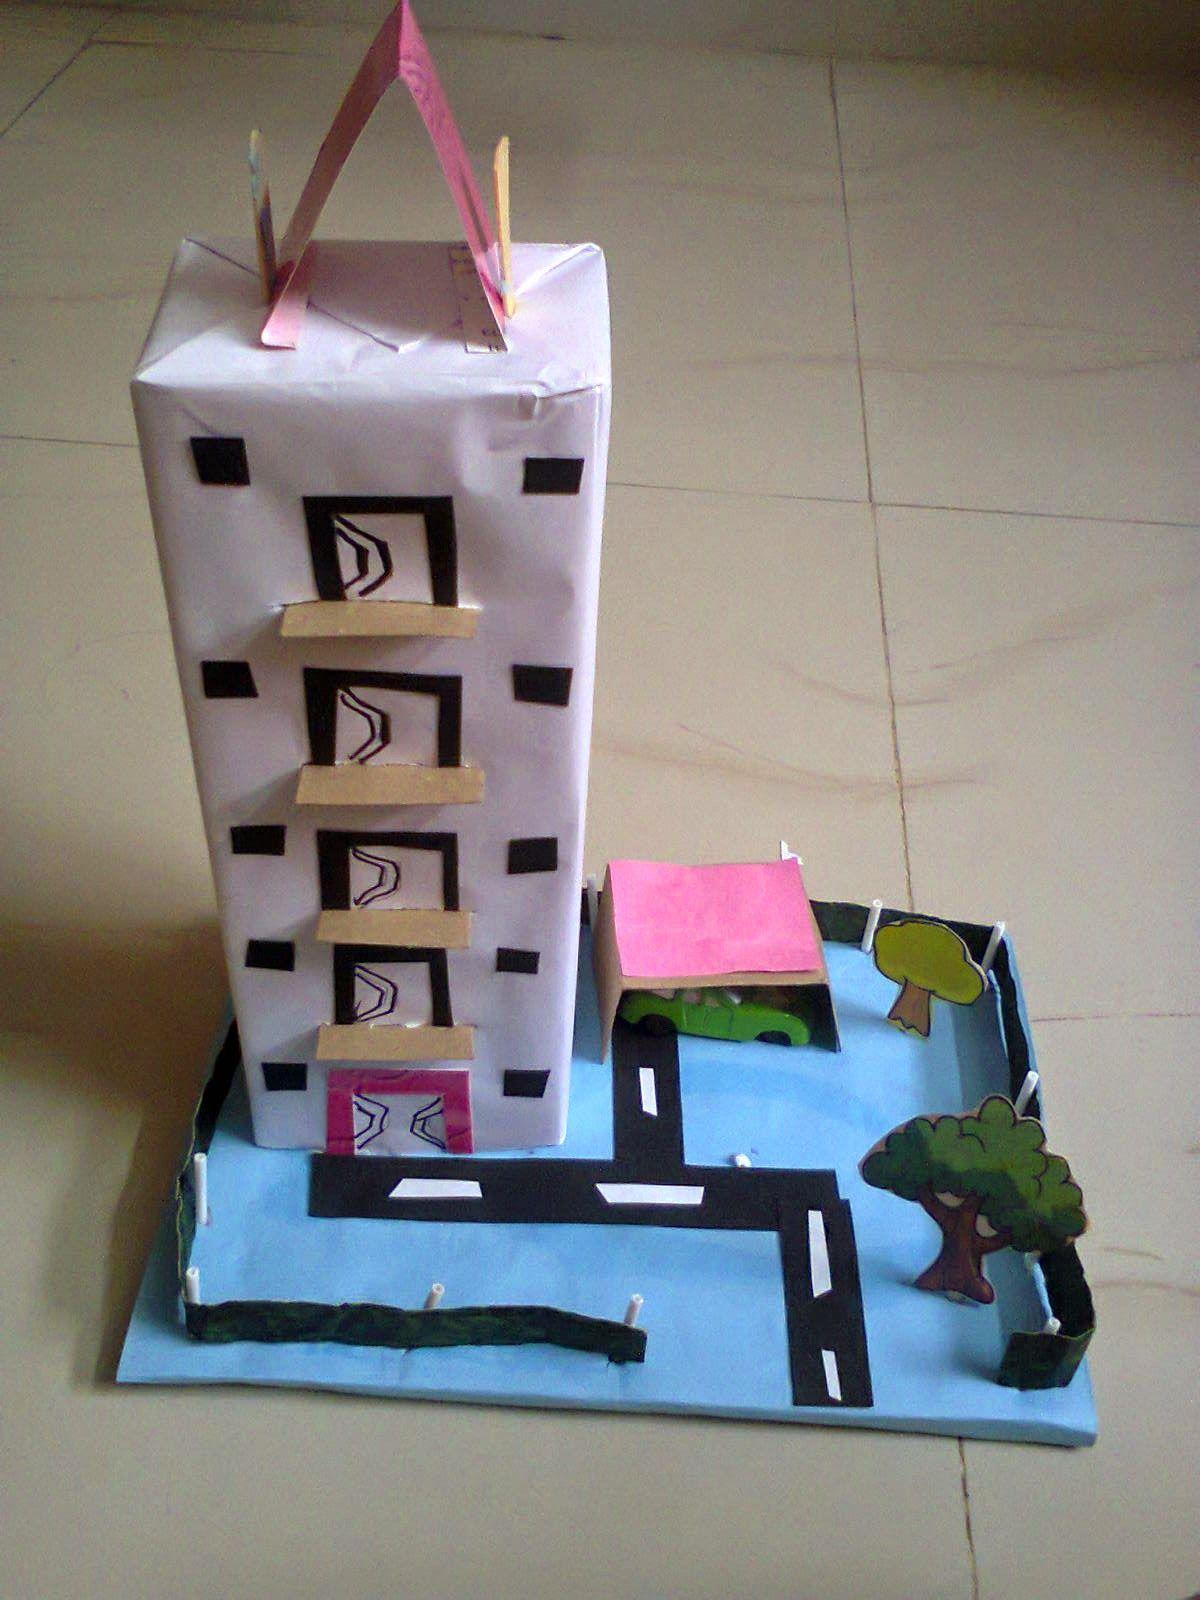 Creative Of Rainy House Model A School Project